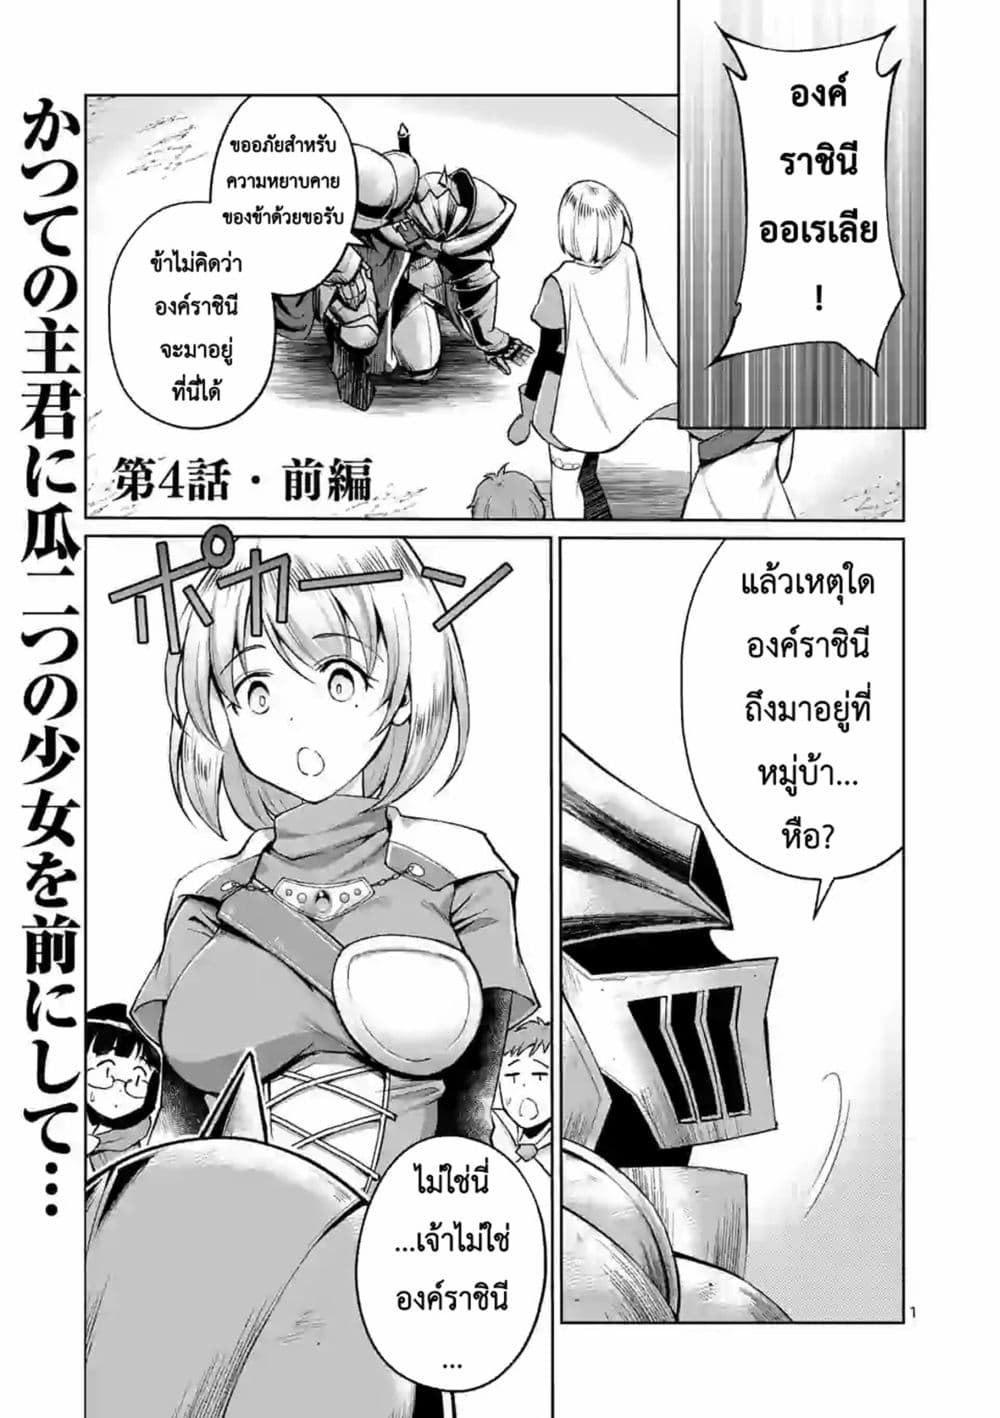 Moto Shogun no Undead Knight-ตอนที่ 4.1